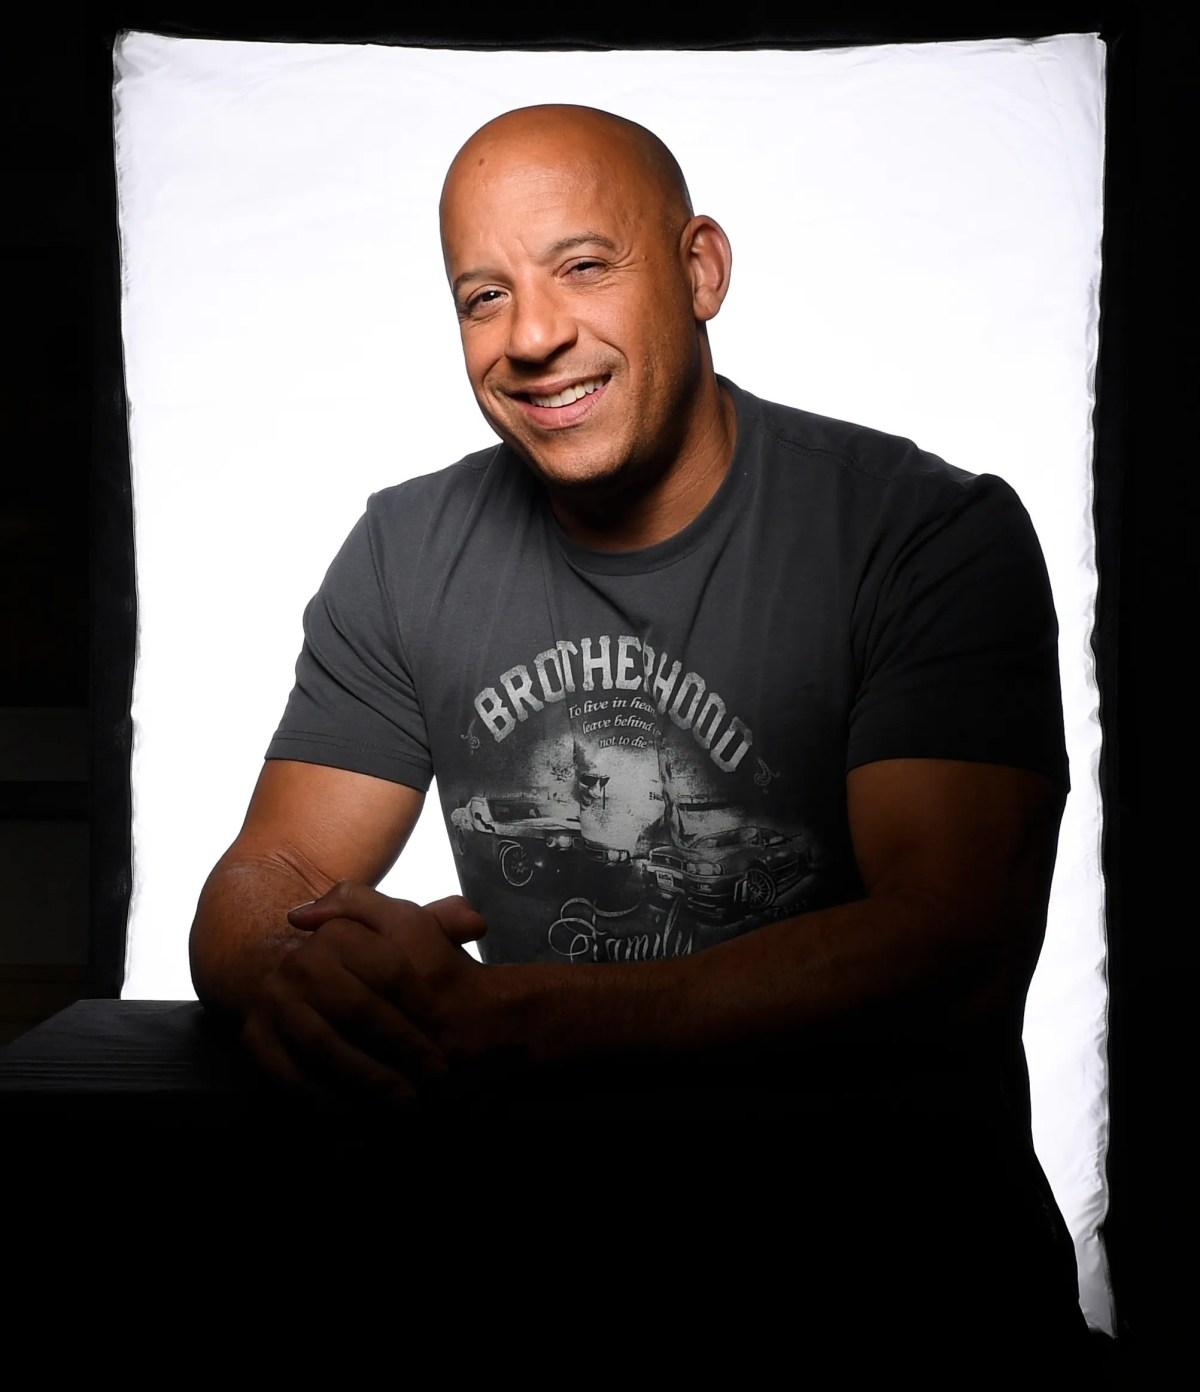 Diesel was born Mark Sinclair on July 18, 1967, in Alameda County, Calif.